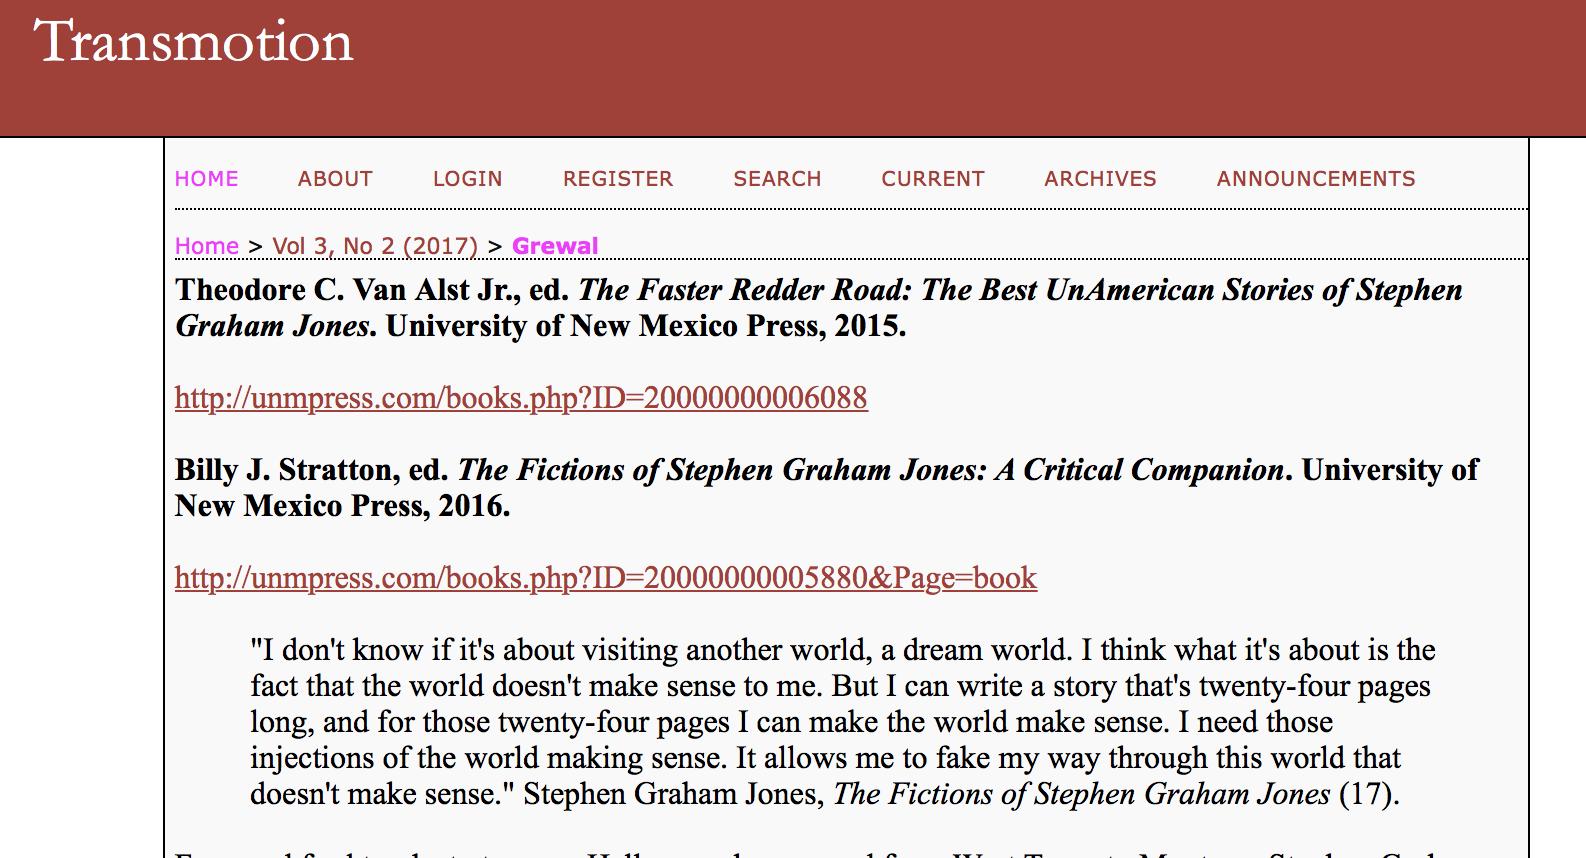 Ed Jones Login >> Couple Of Kind Reviews And An Article Stephen Graham Jones